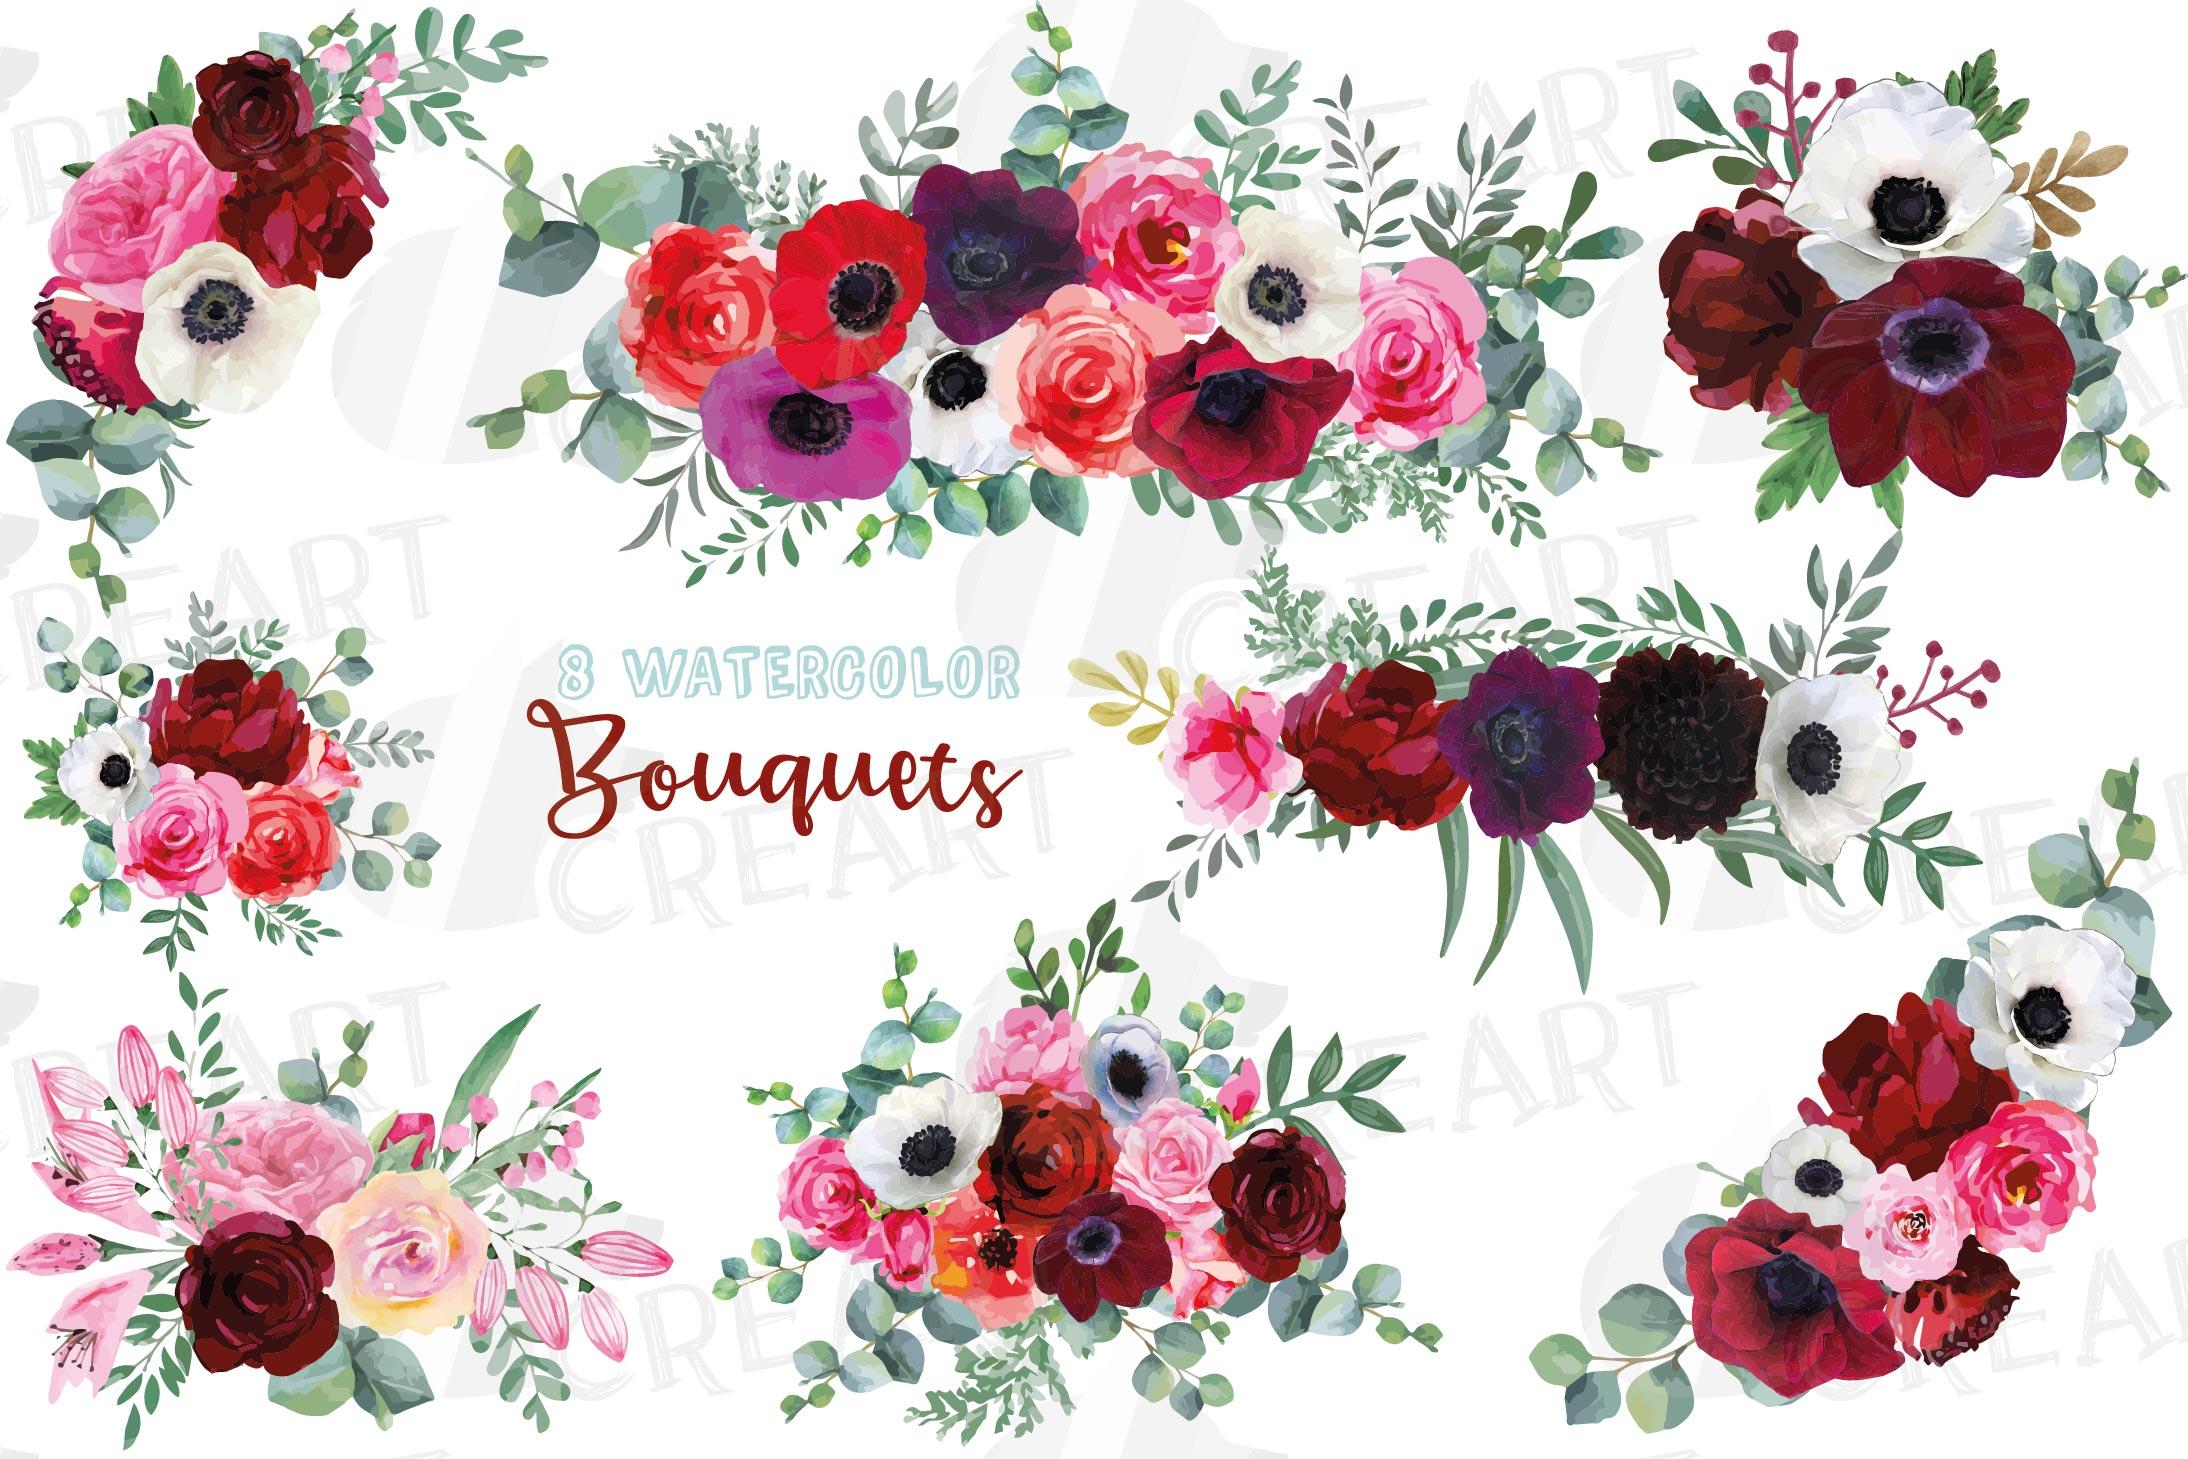 Watercolor elegant floral bouquets, rose, anemone decoration example image 1